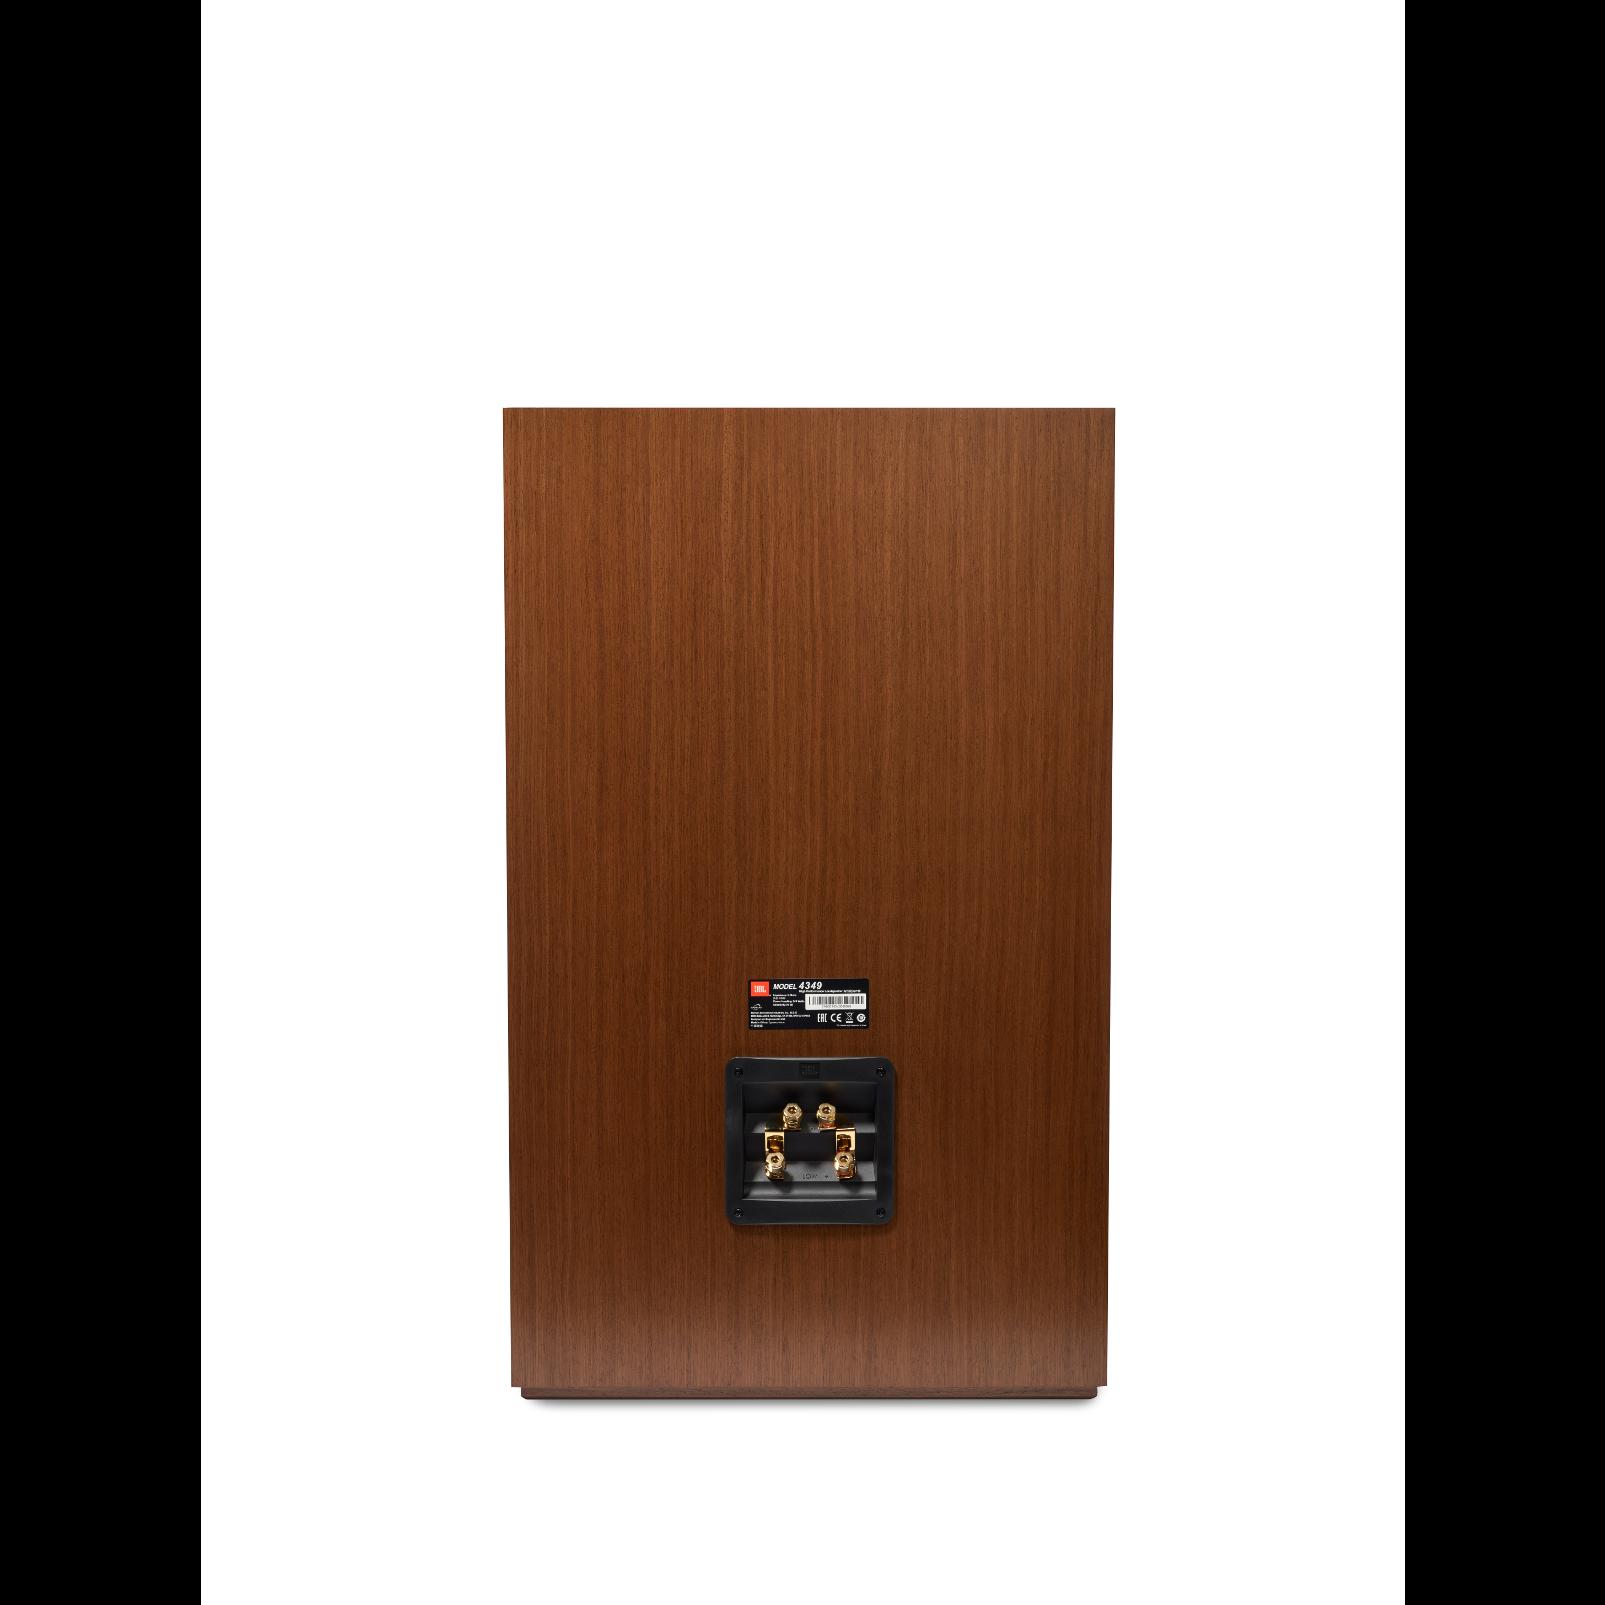 4349 - Walnut - 12-inch (300mm) 2-way Studio Monitor Loudspeaker - Back